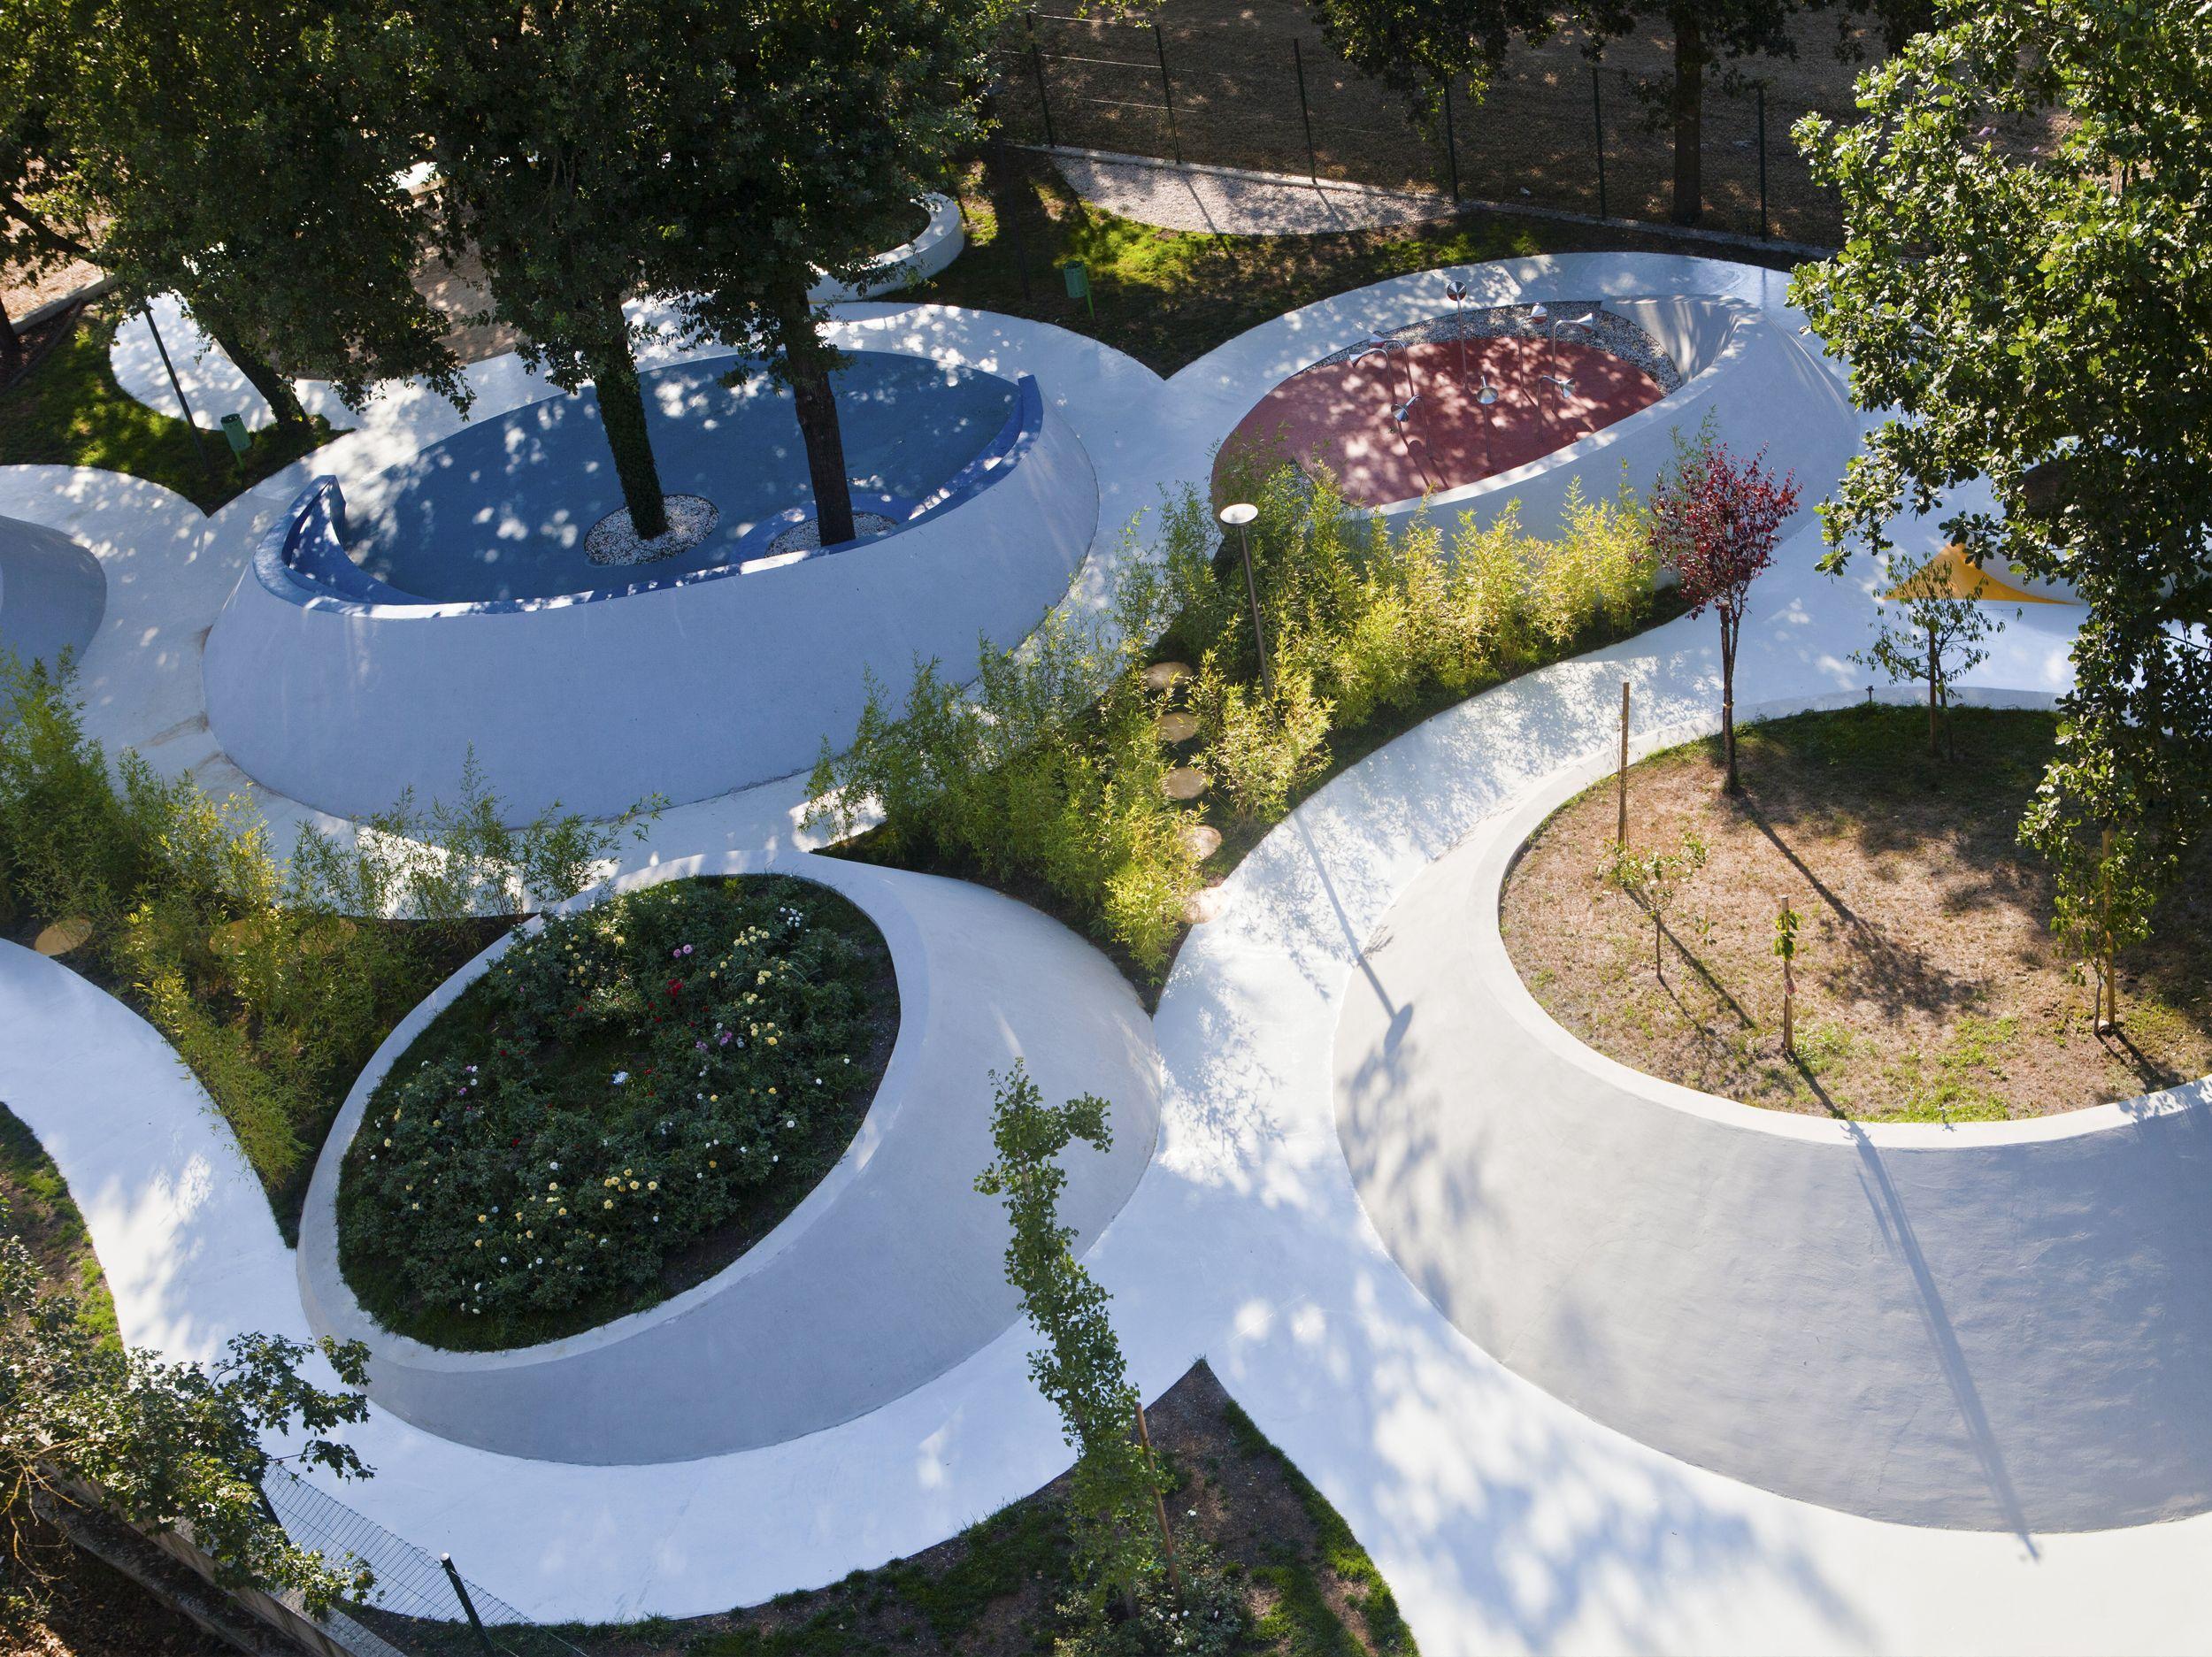 sensational design contemporary landscaping ideas. Sensational Garden  ITALY senses play relations society rights citizens Contemporary LandscapeLandscape DesignsLandscape